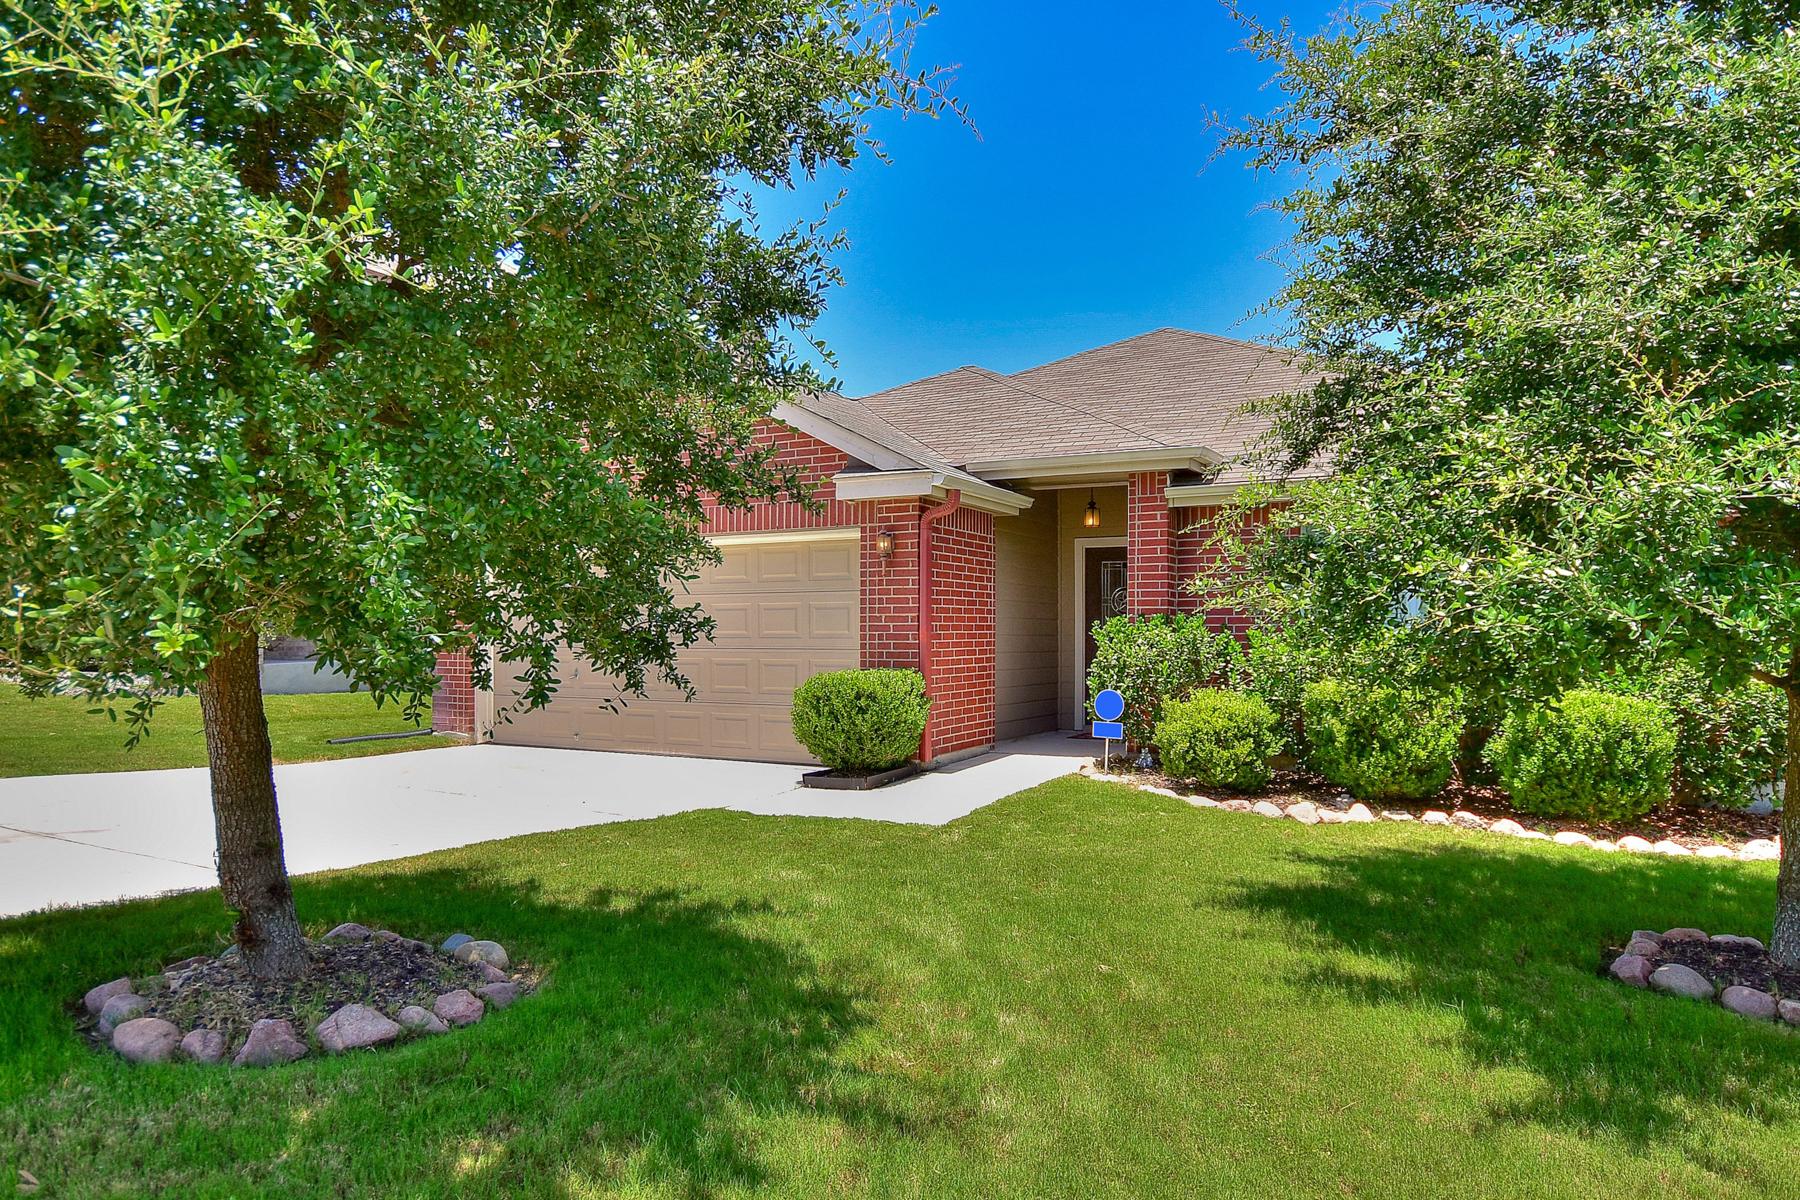 Casa Unifamiliar por un Venta en Beautiful One-Story Home in Cibolo Vista 108 Canyon Vis Cibolo, Texas 78108 Estados Unidos